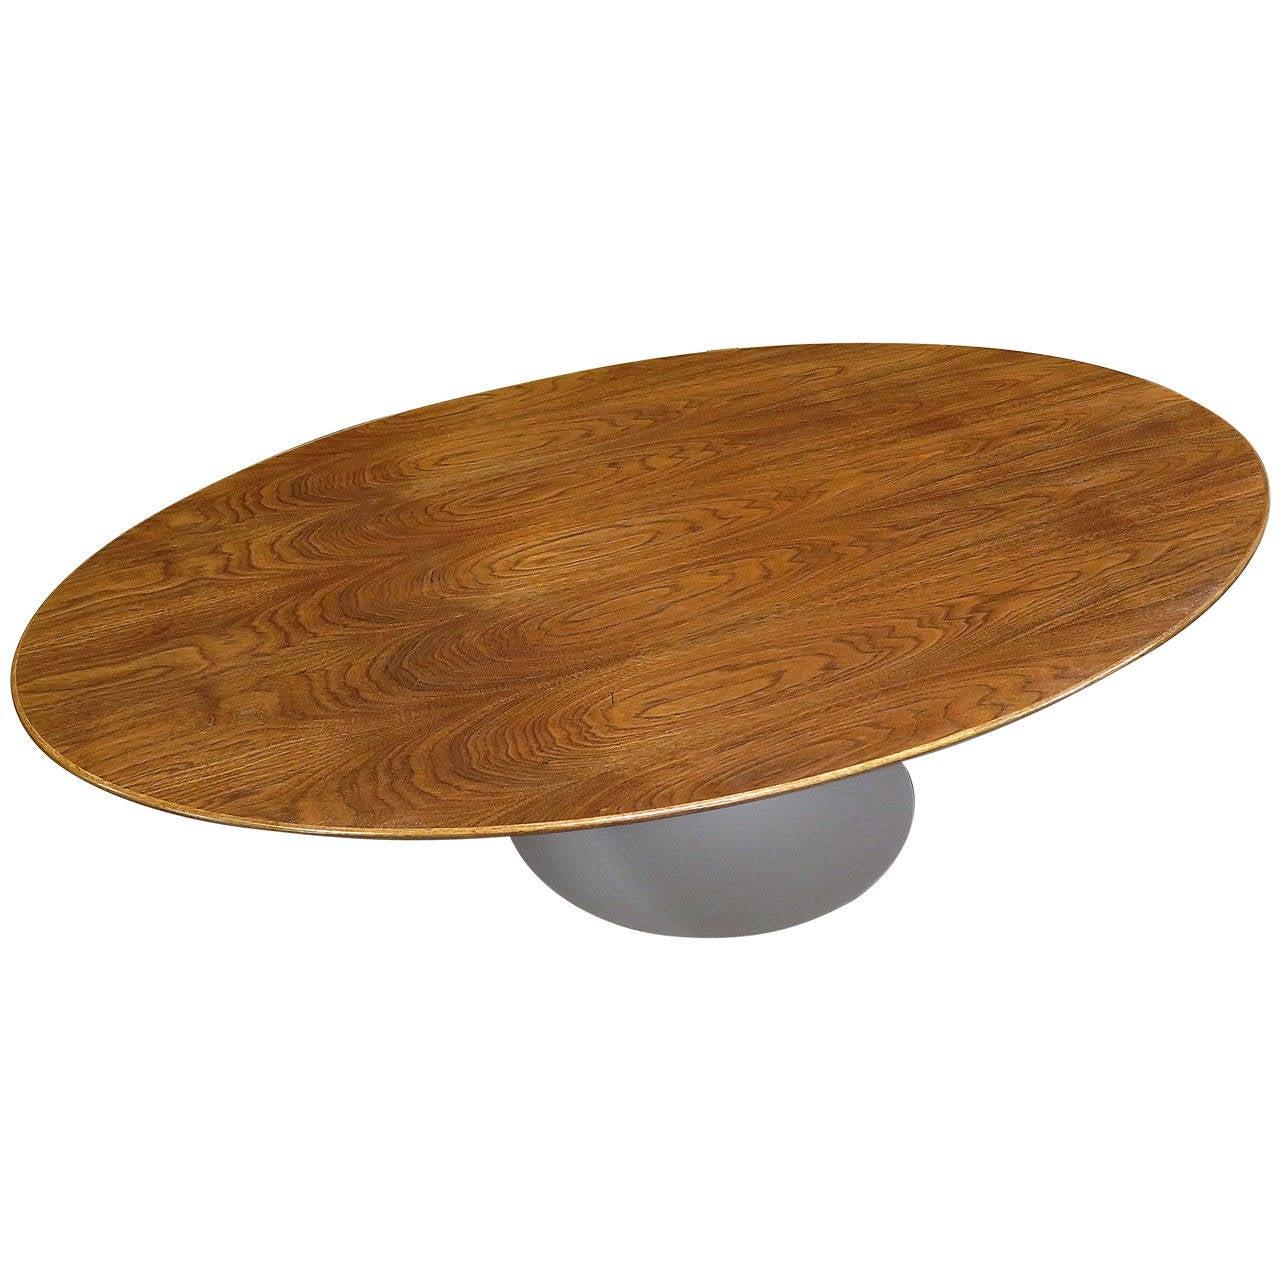 Rare 1960 saarinen oval coffee table at 1stdibs rare 1960 saarinen oval coffee table 1 geotapseo Choice Image